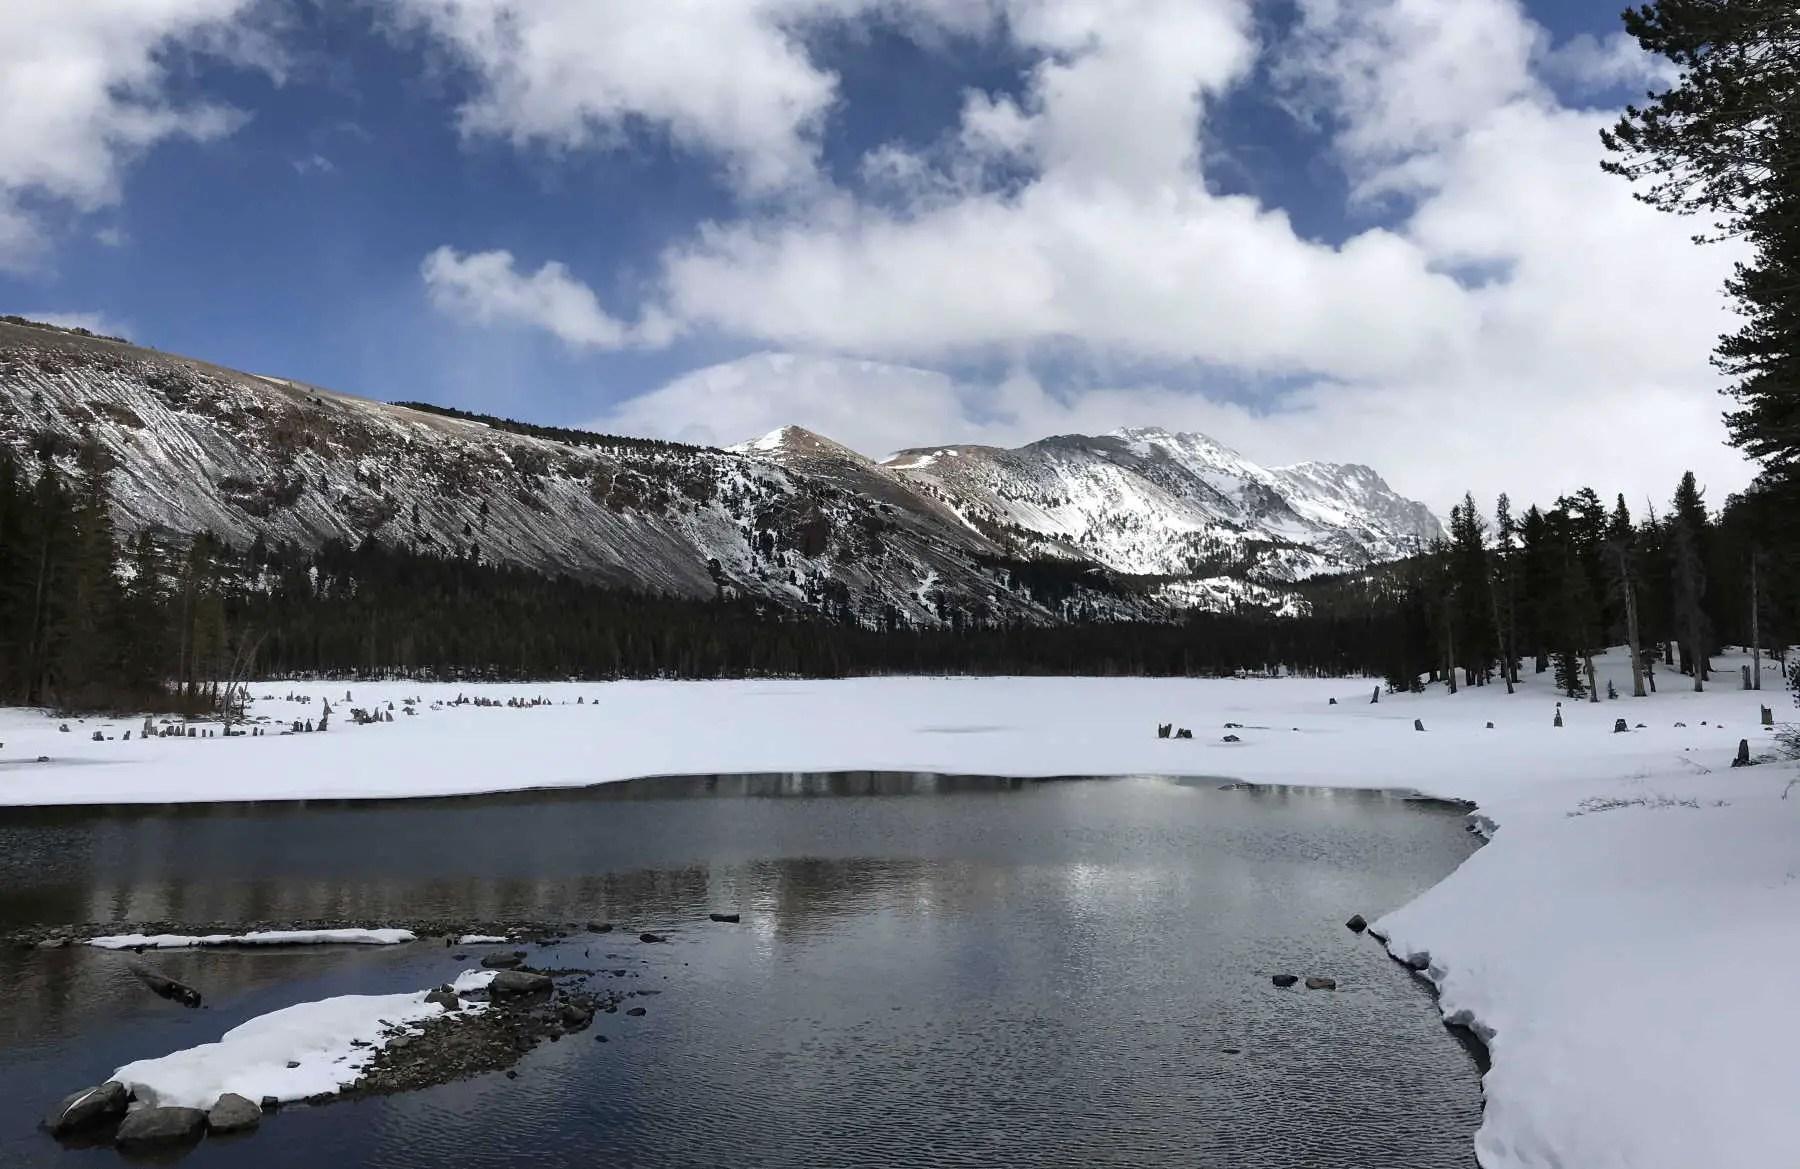 Lake Mary trail at the Tamarack Cross-Country Ski Center